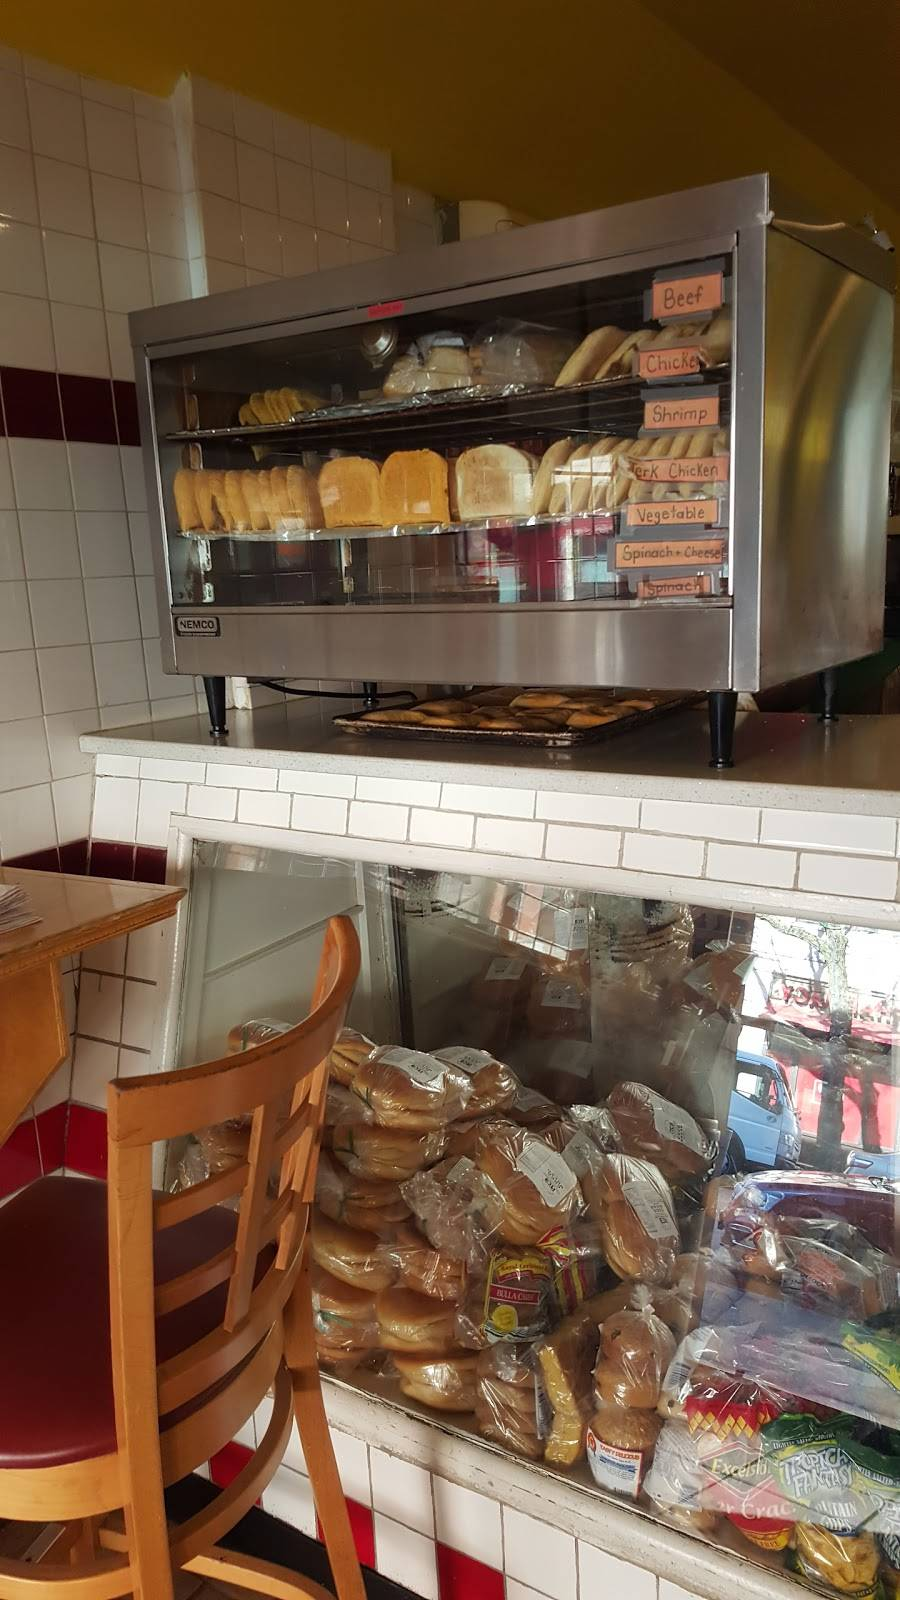 Buff Patty | bakery | 376 Myrtle Ave, Brooklyn, NY 11205, USA | 7188553266 OR +1 718-855-3266